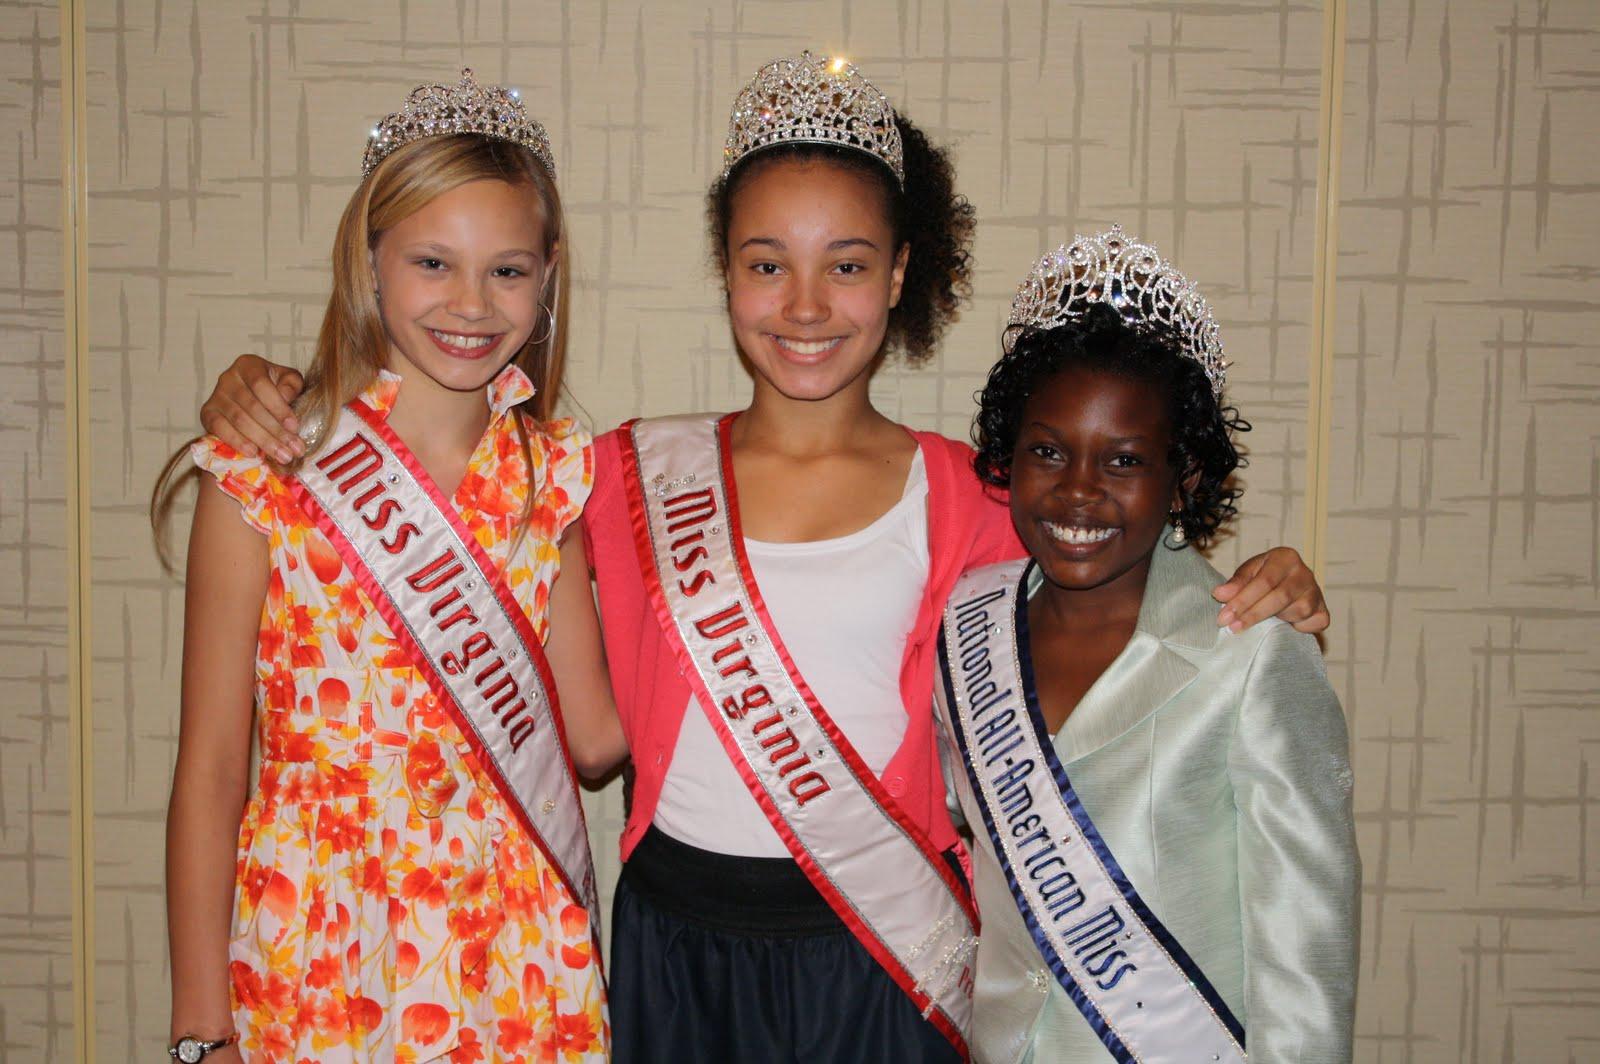 Pageants & Pearls: June 2013